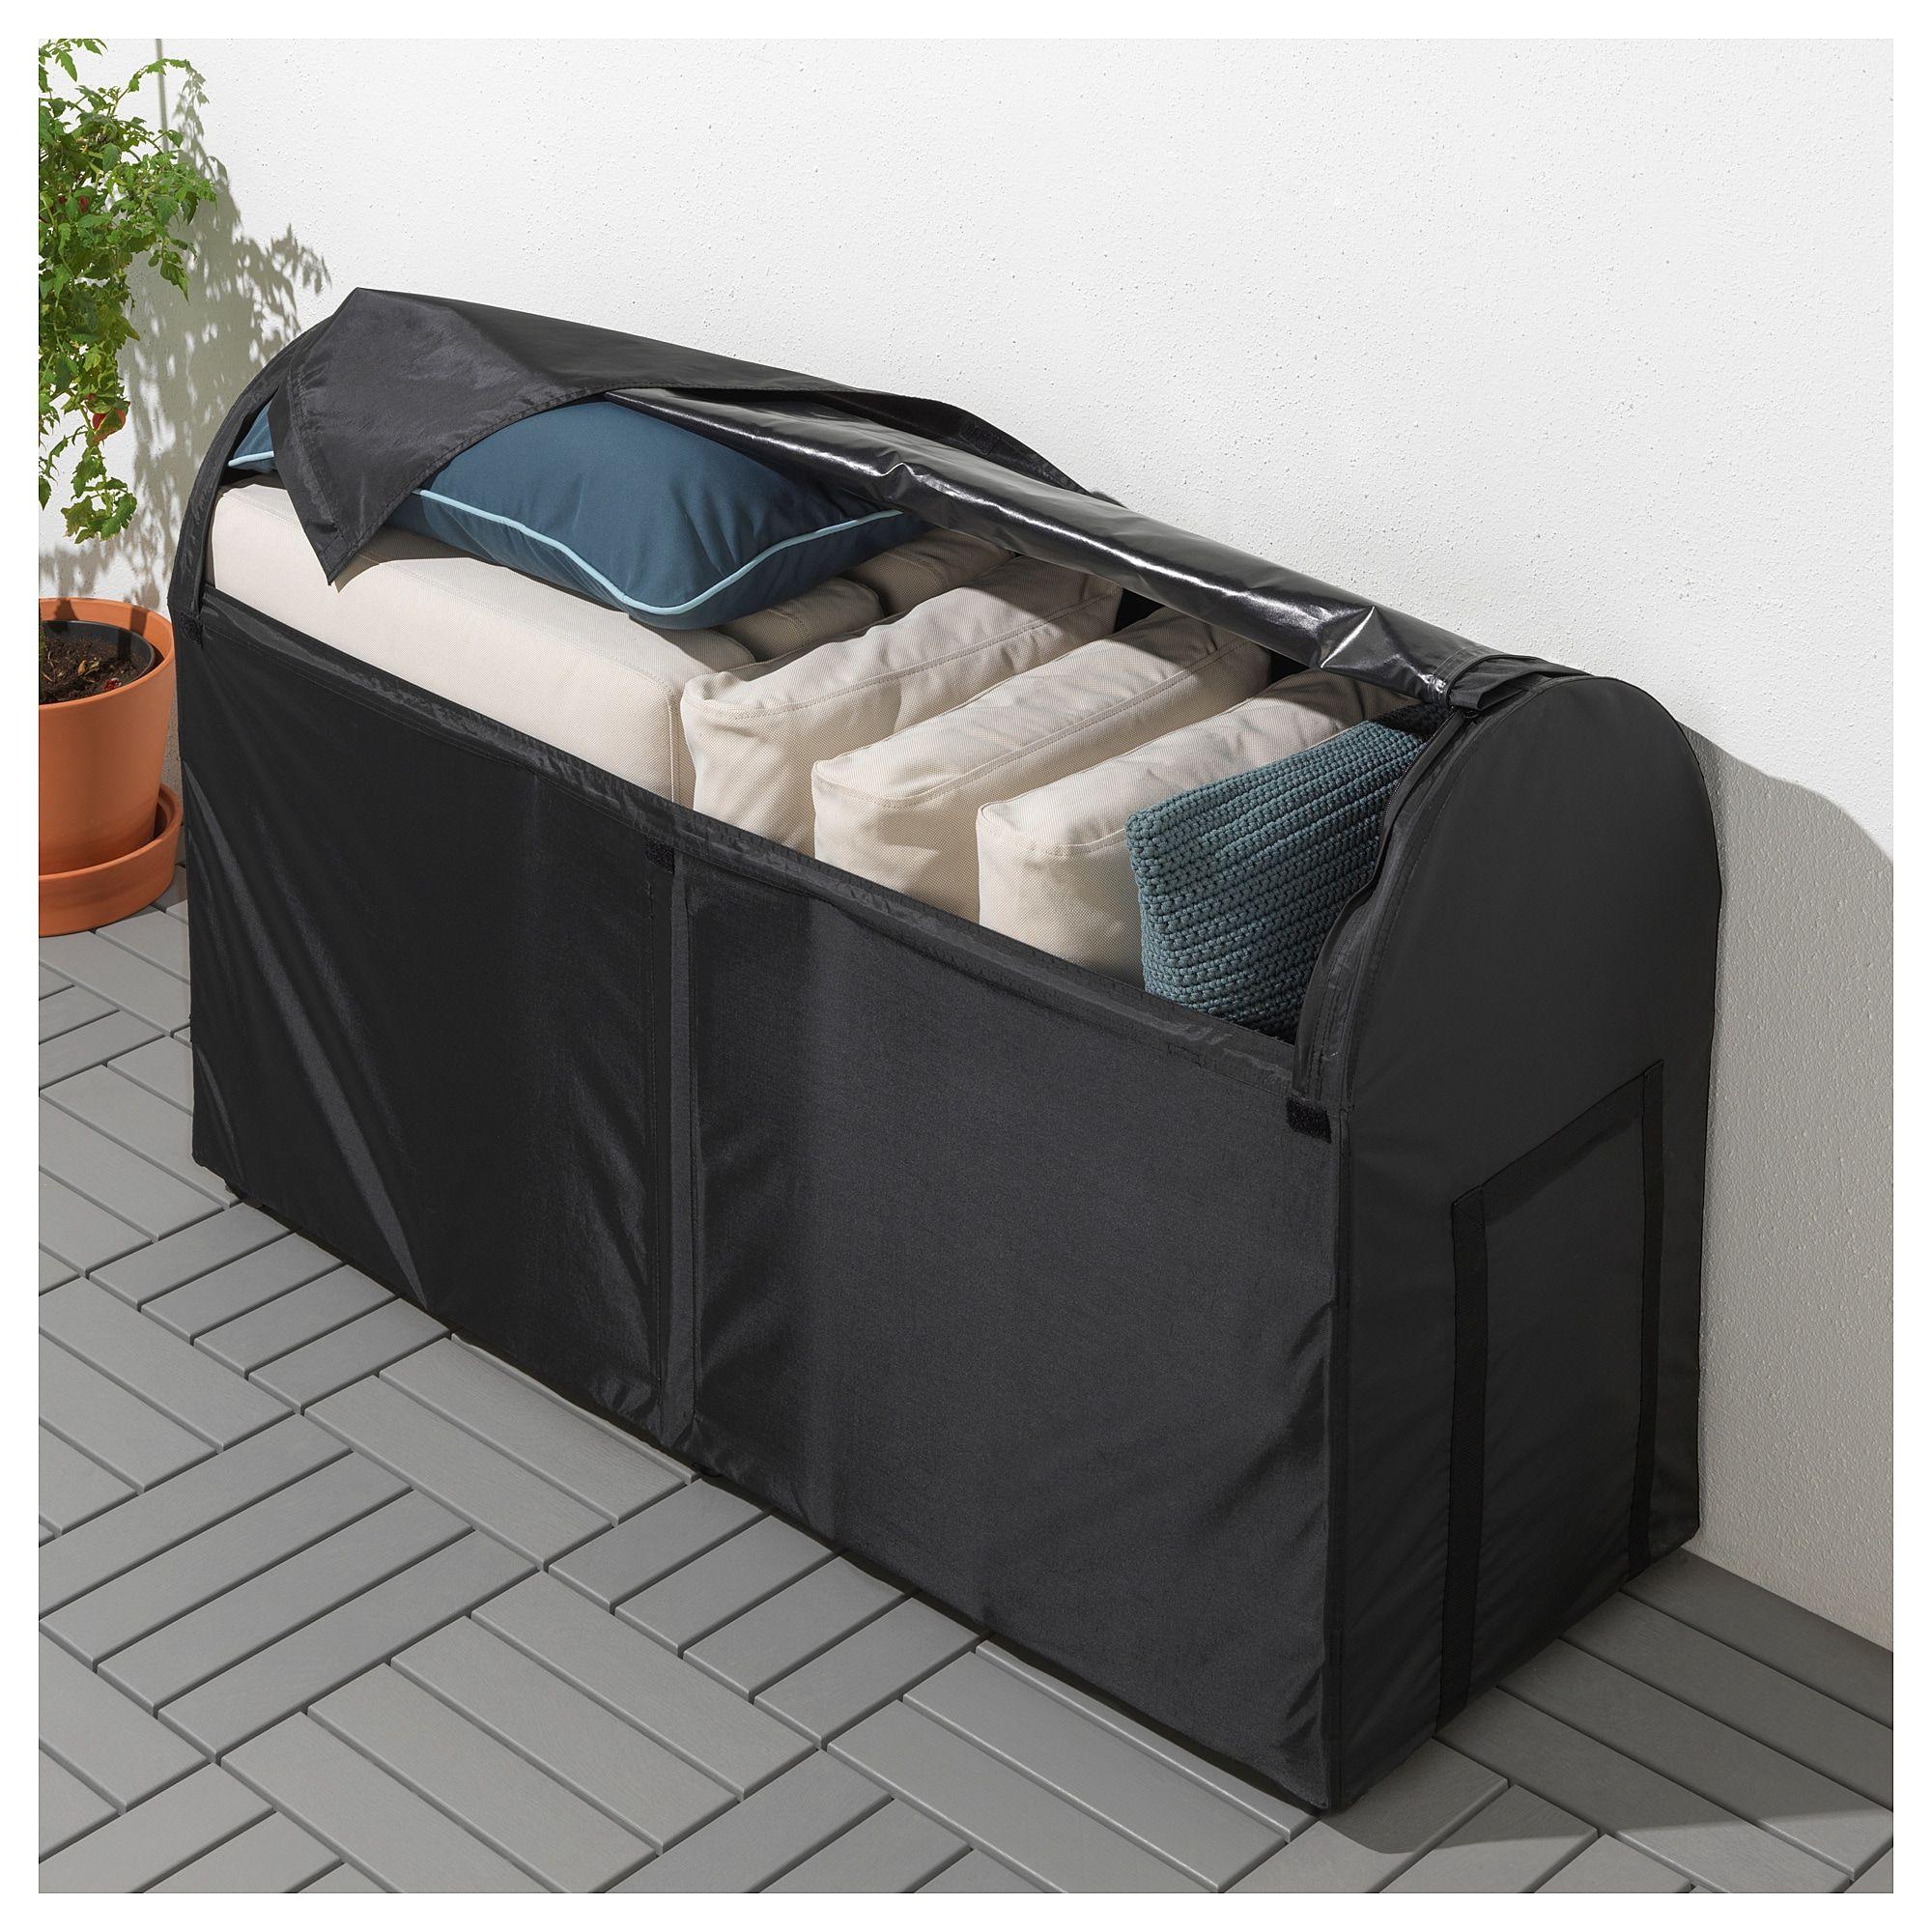 Tostero Storage Box Outdoor Black 50 3 4x17 3 8x31 1 8